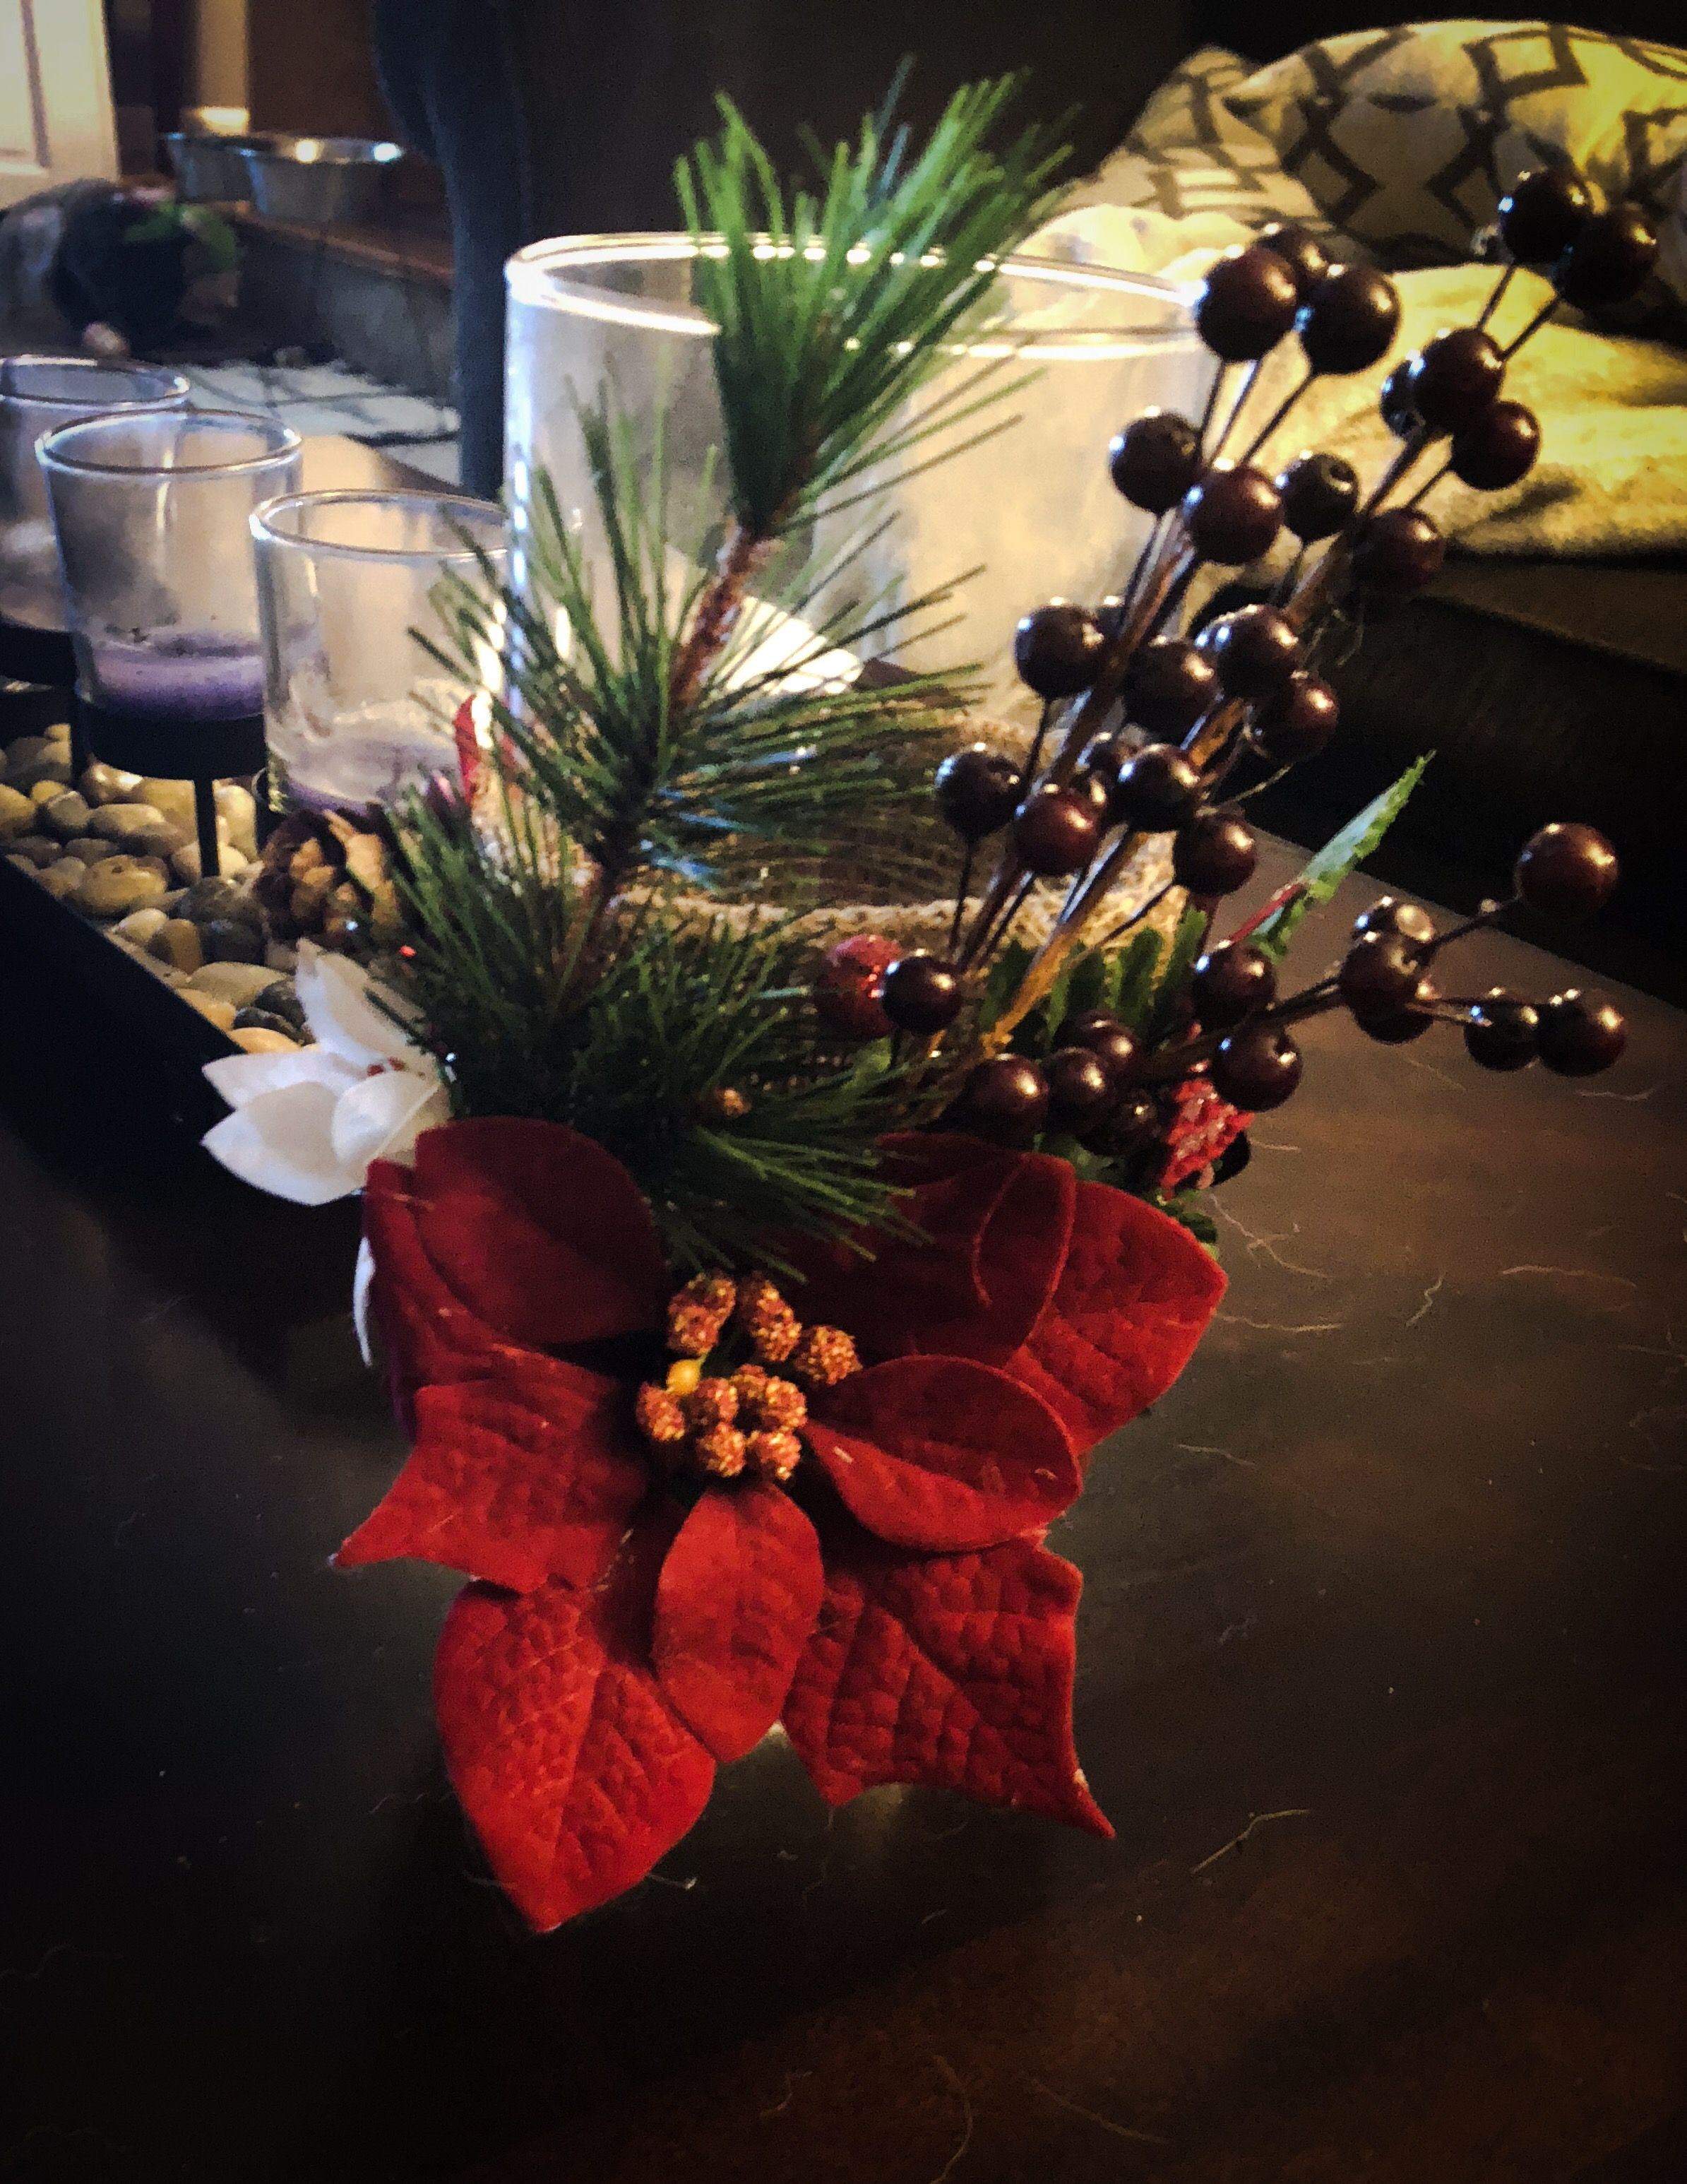 Pin by Ashley Bacon on DIY   Mason jar candle holders, Christmas wreaths, Holiday decor